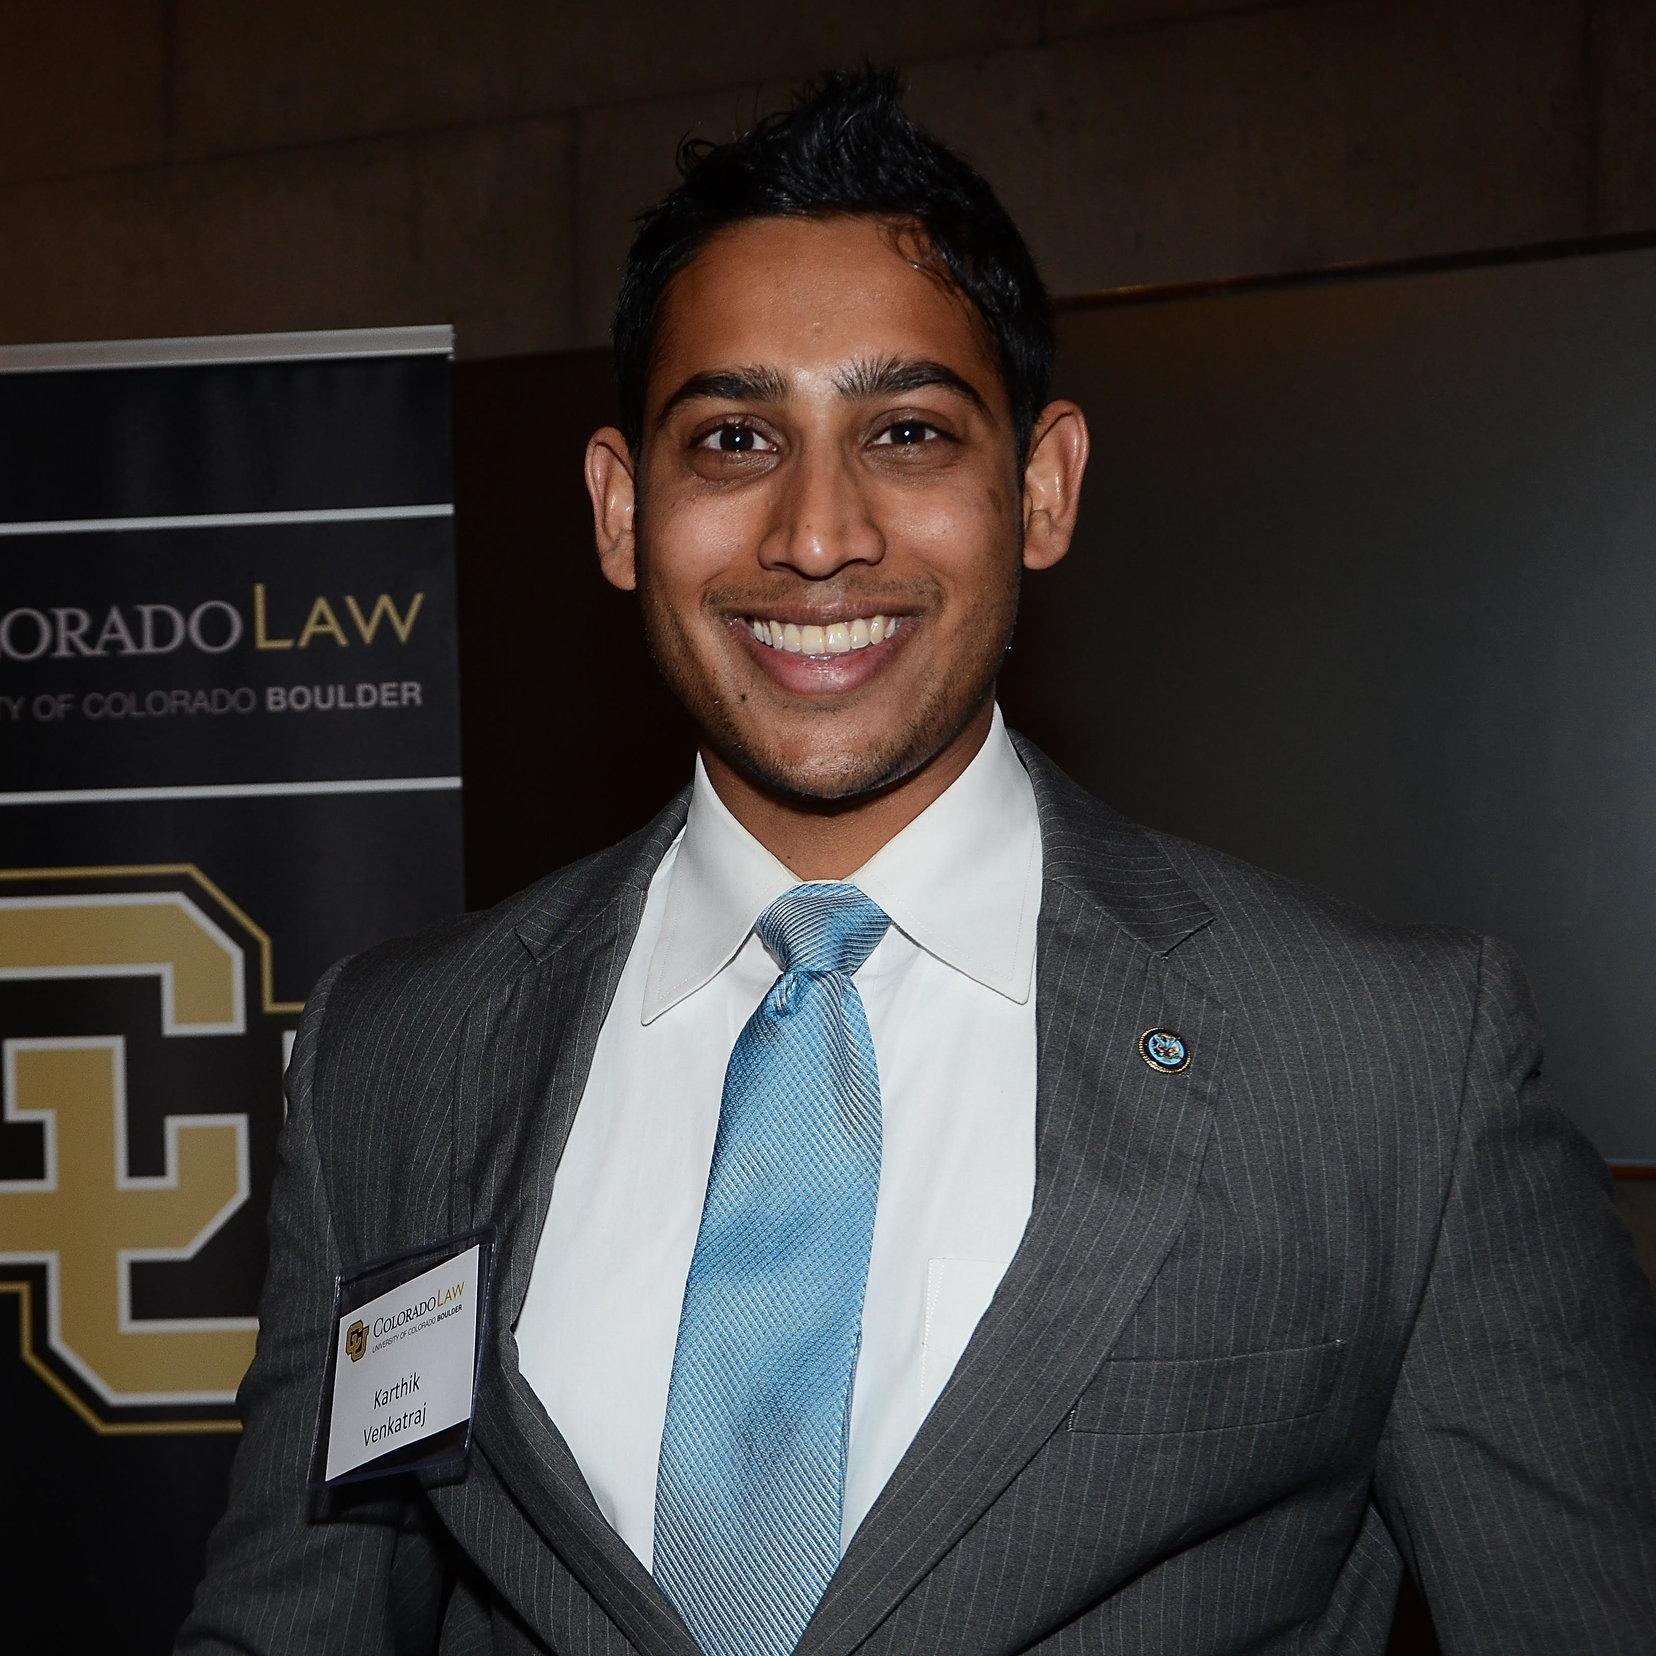 Karthik Venkatraj is a 3L Student at University of Colorado Law School